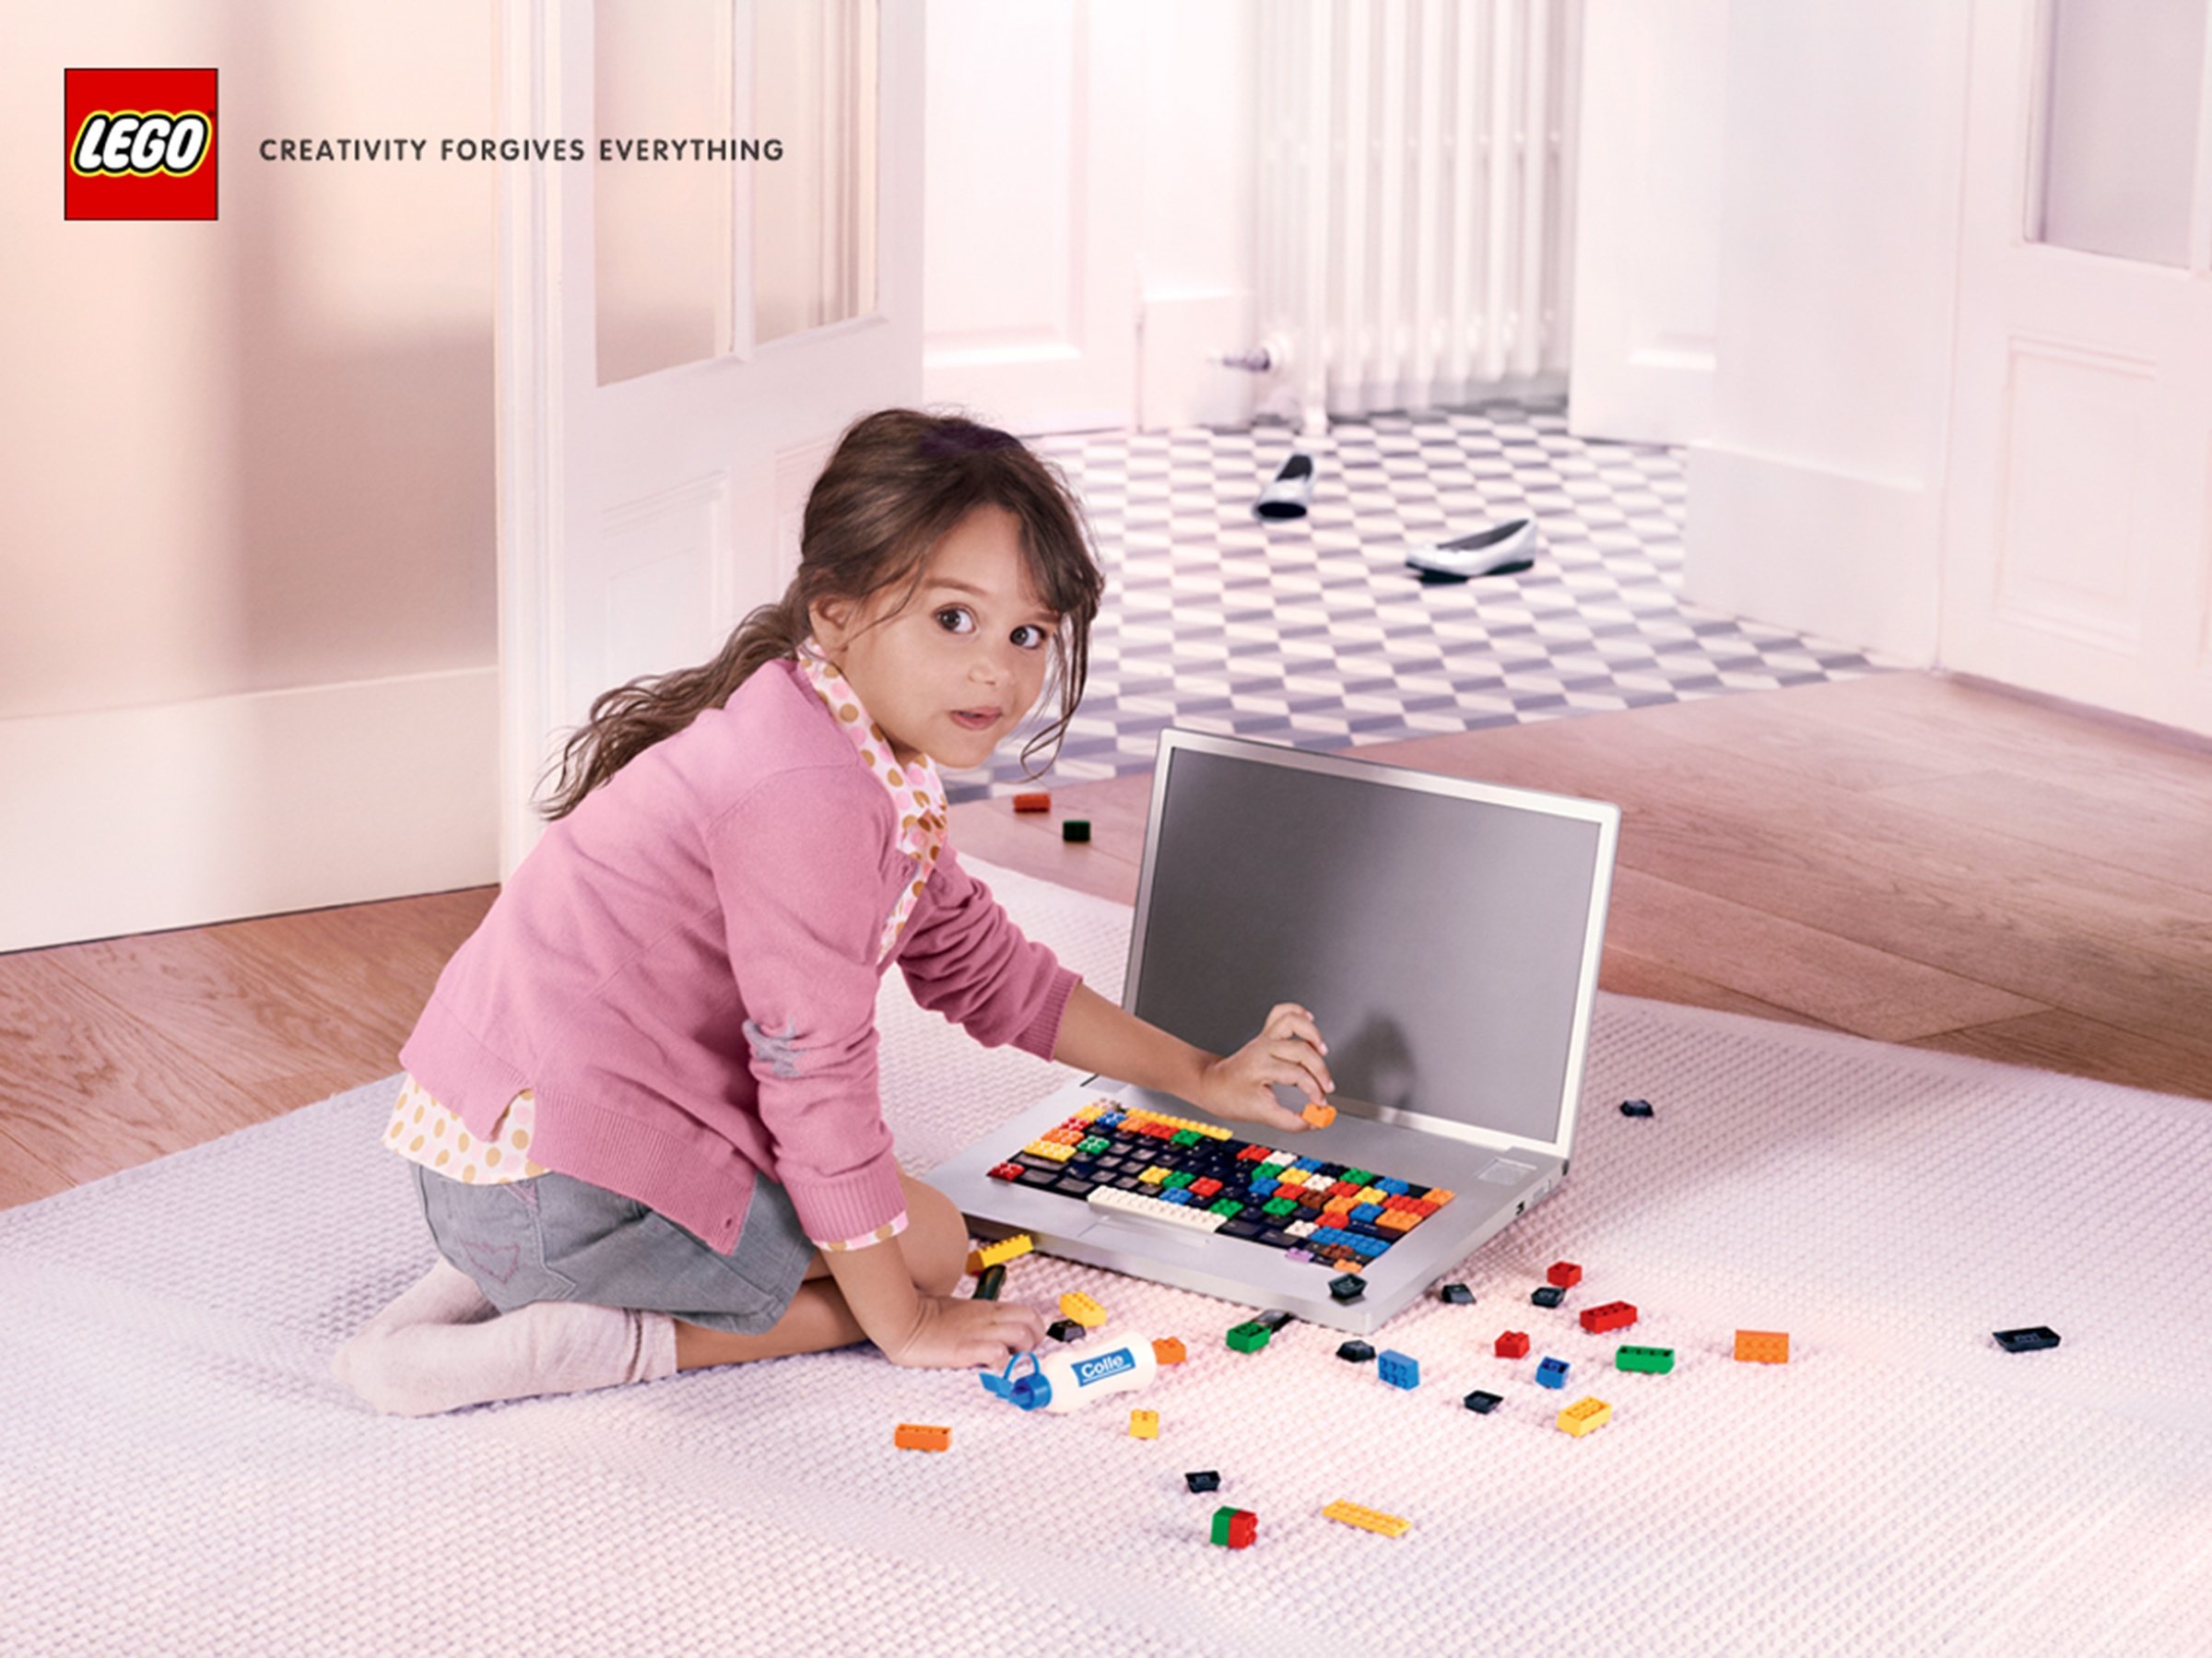 pathos ad ethos Lego logos